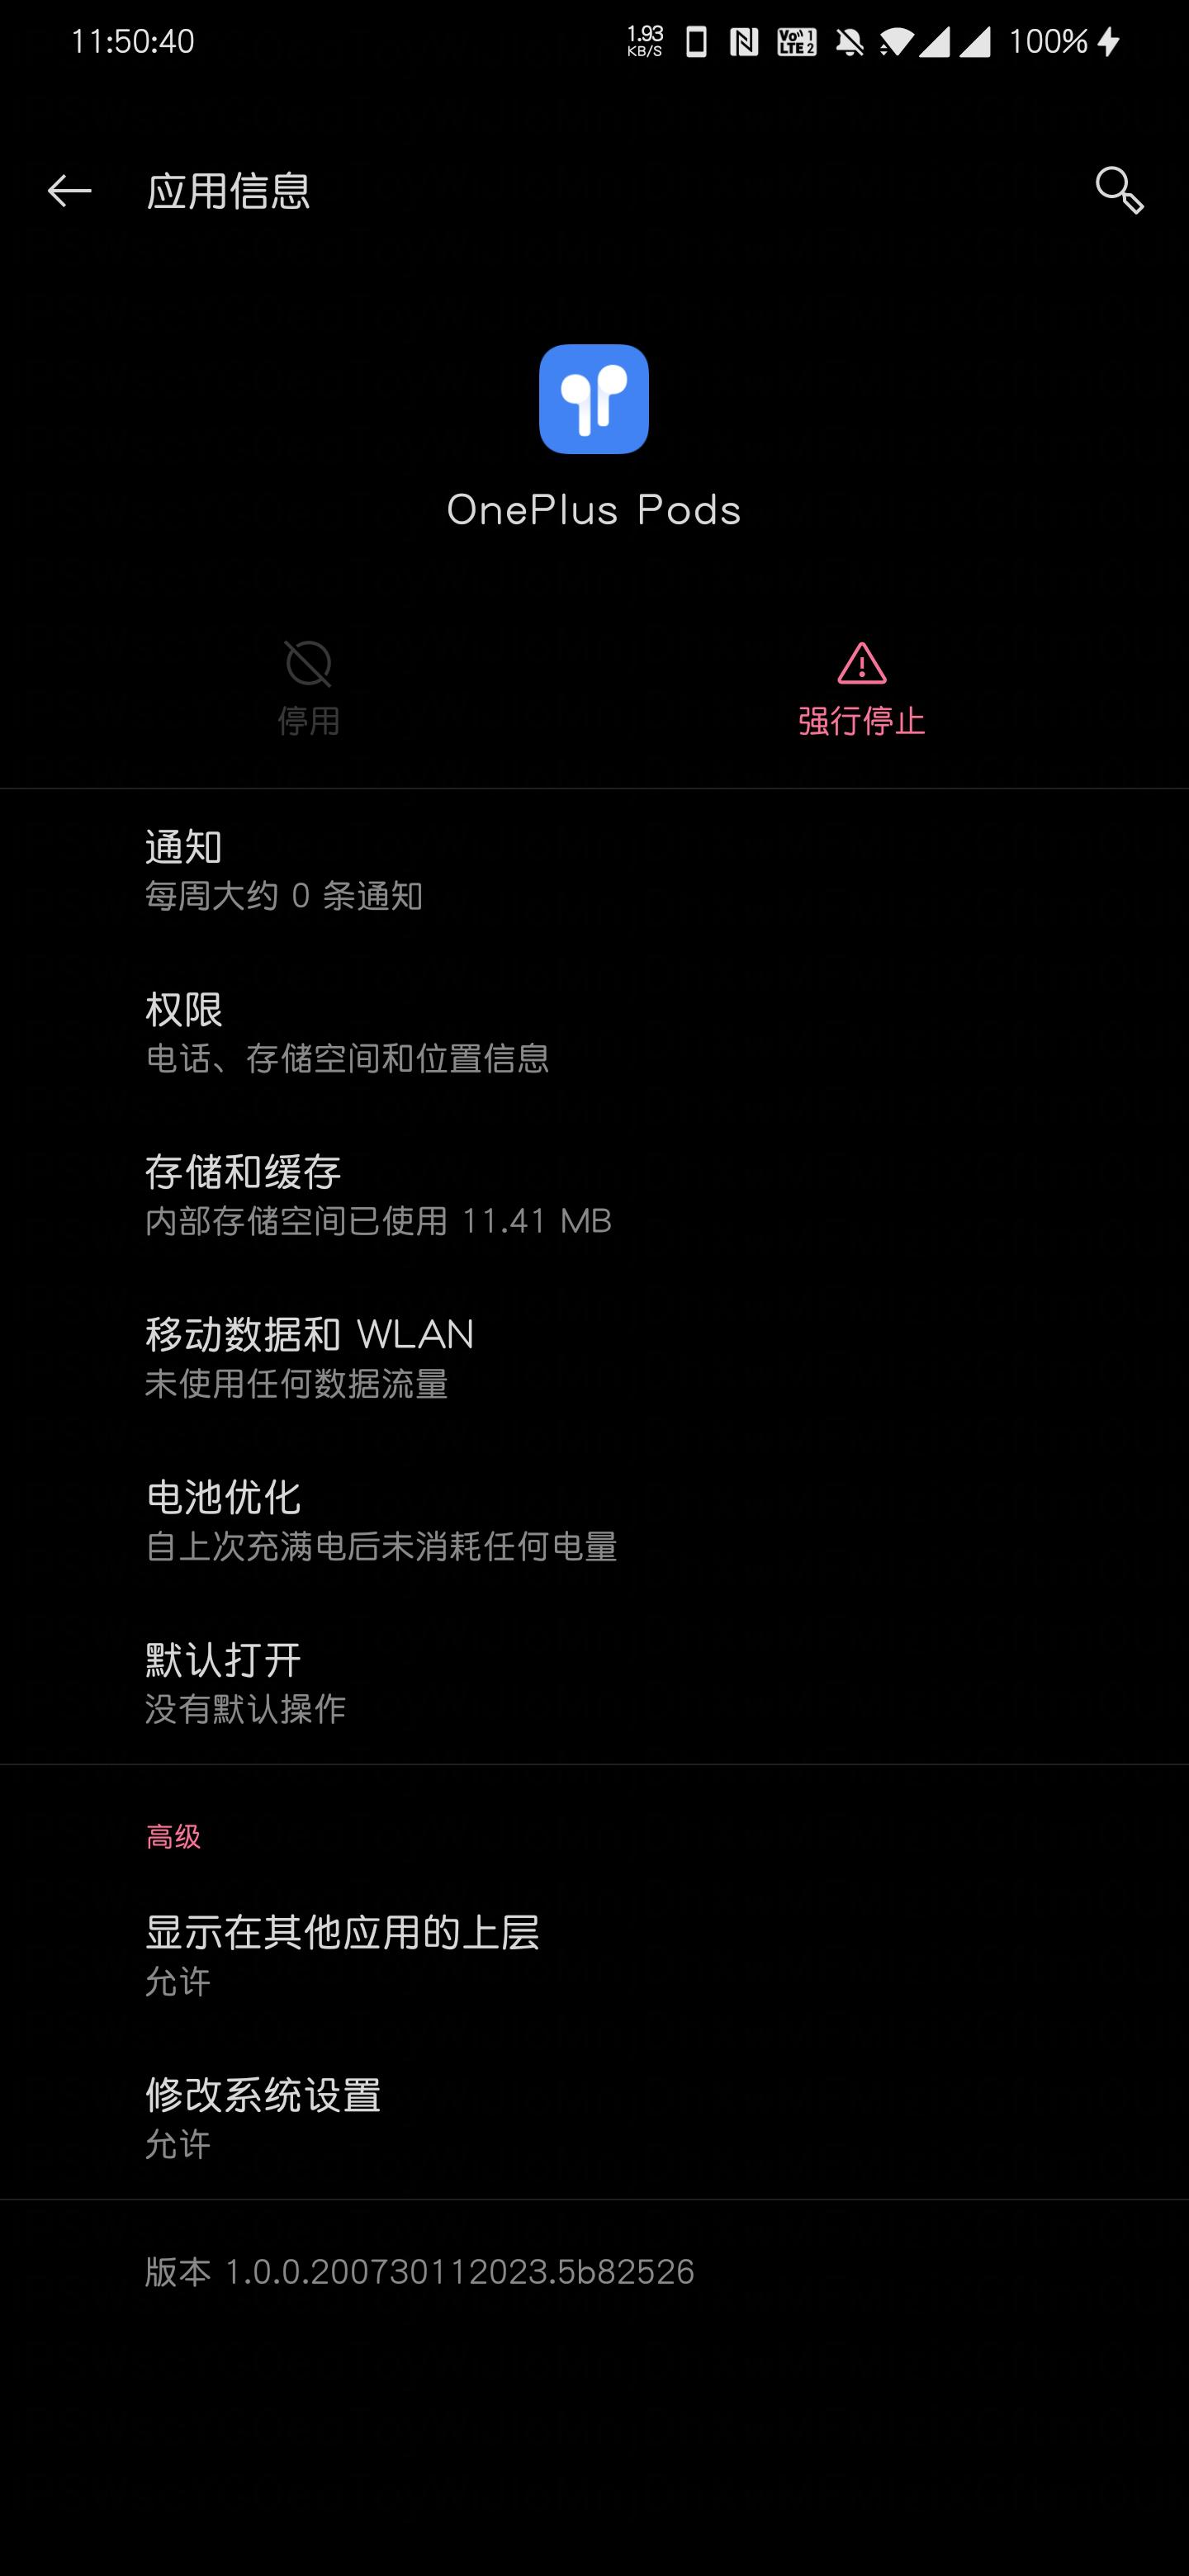 Screenshot_20200806-115041.png